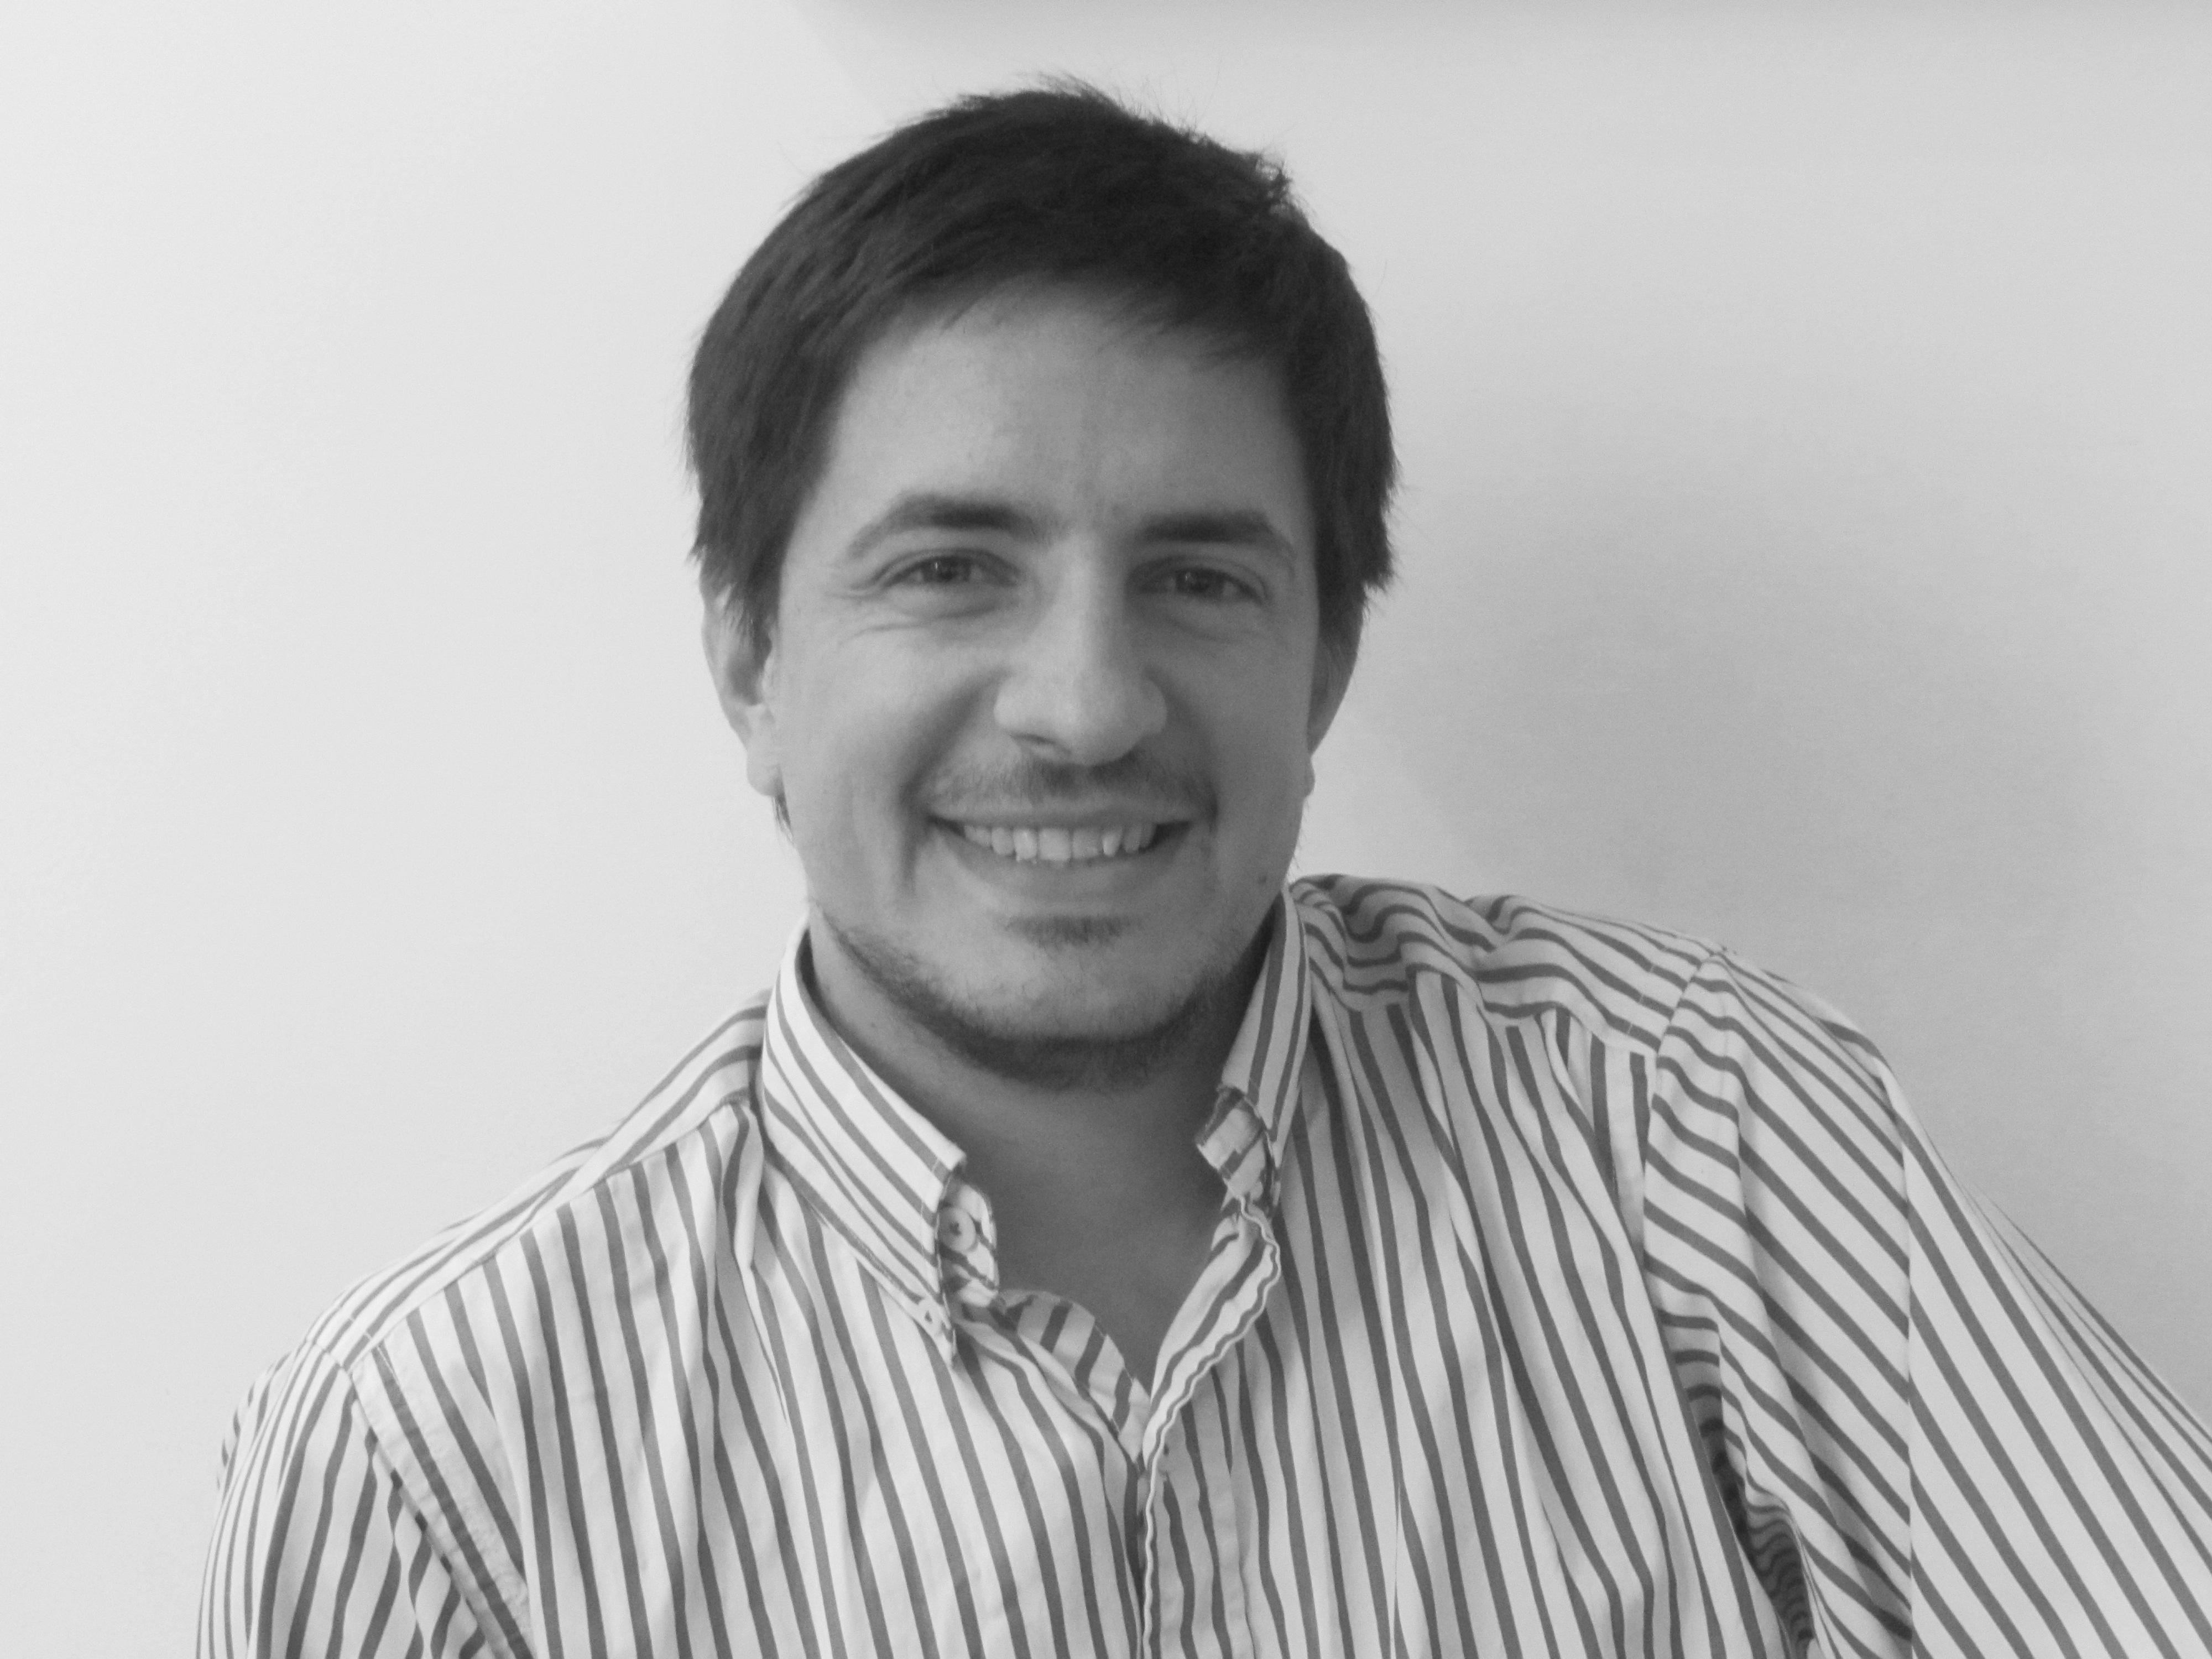 Pablo Pedebernade